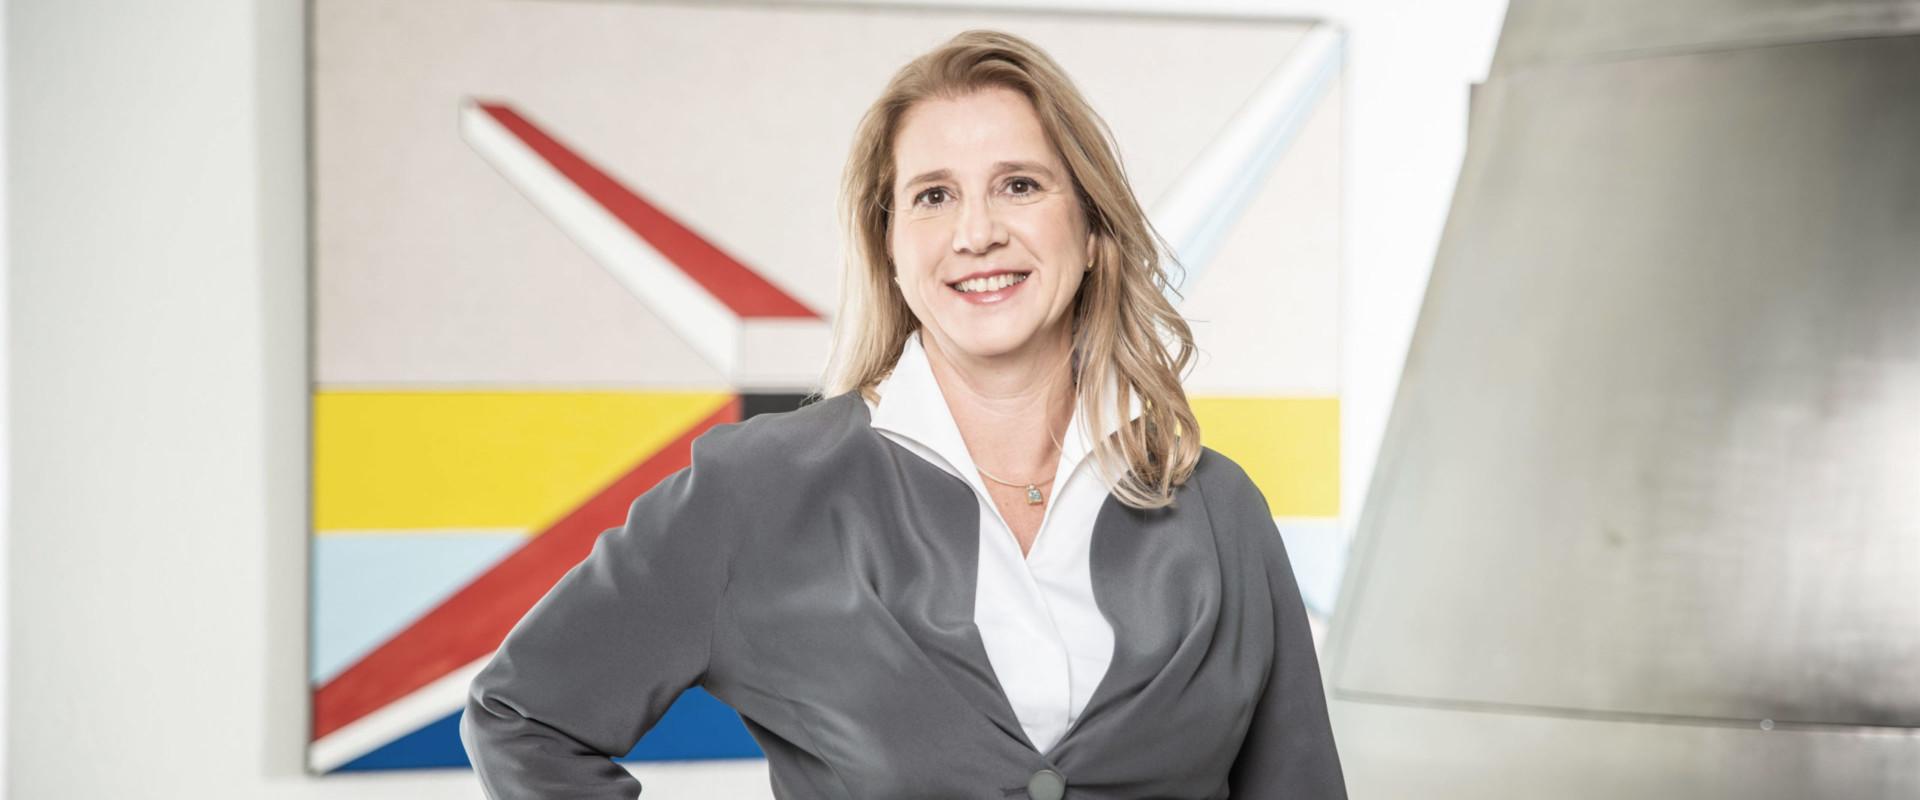 Susanne_Hirschmann-Menke_1